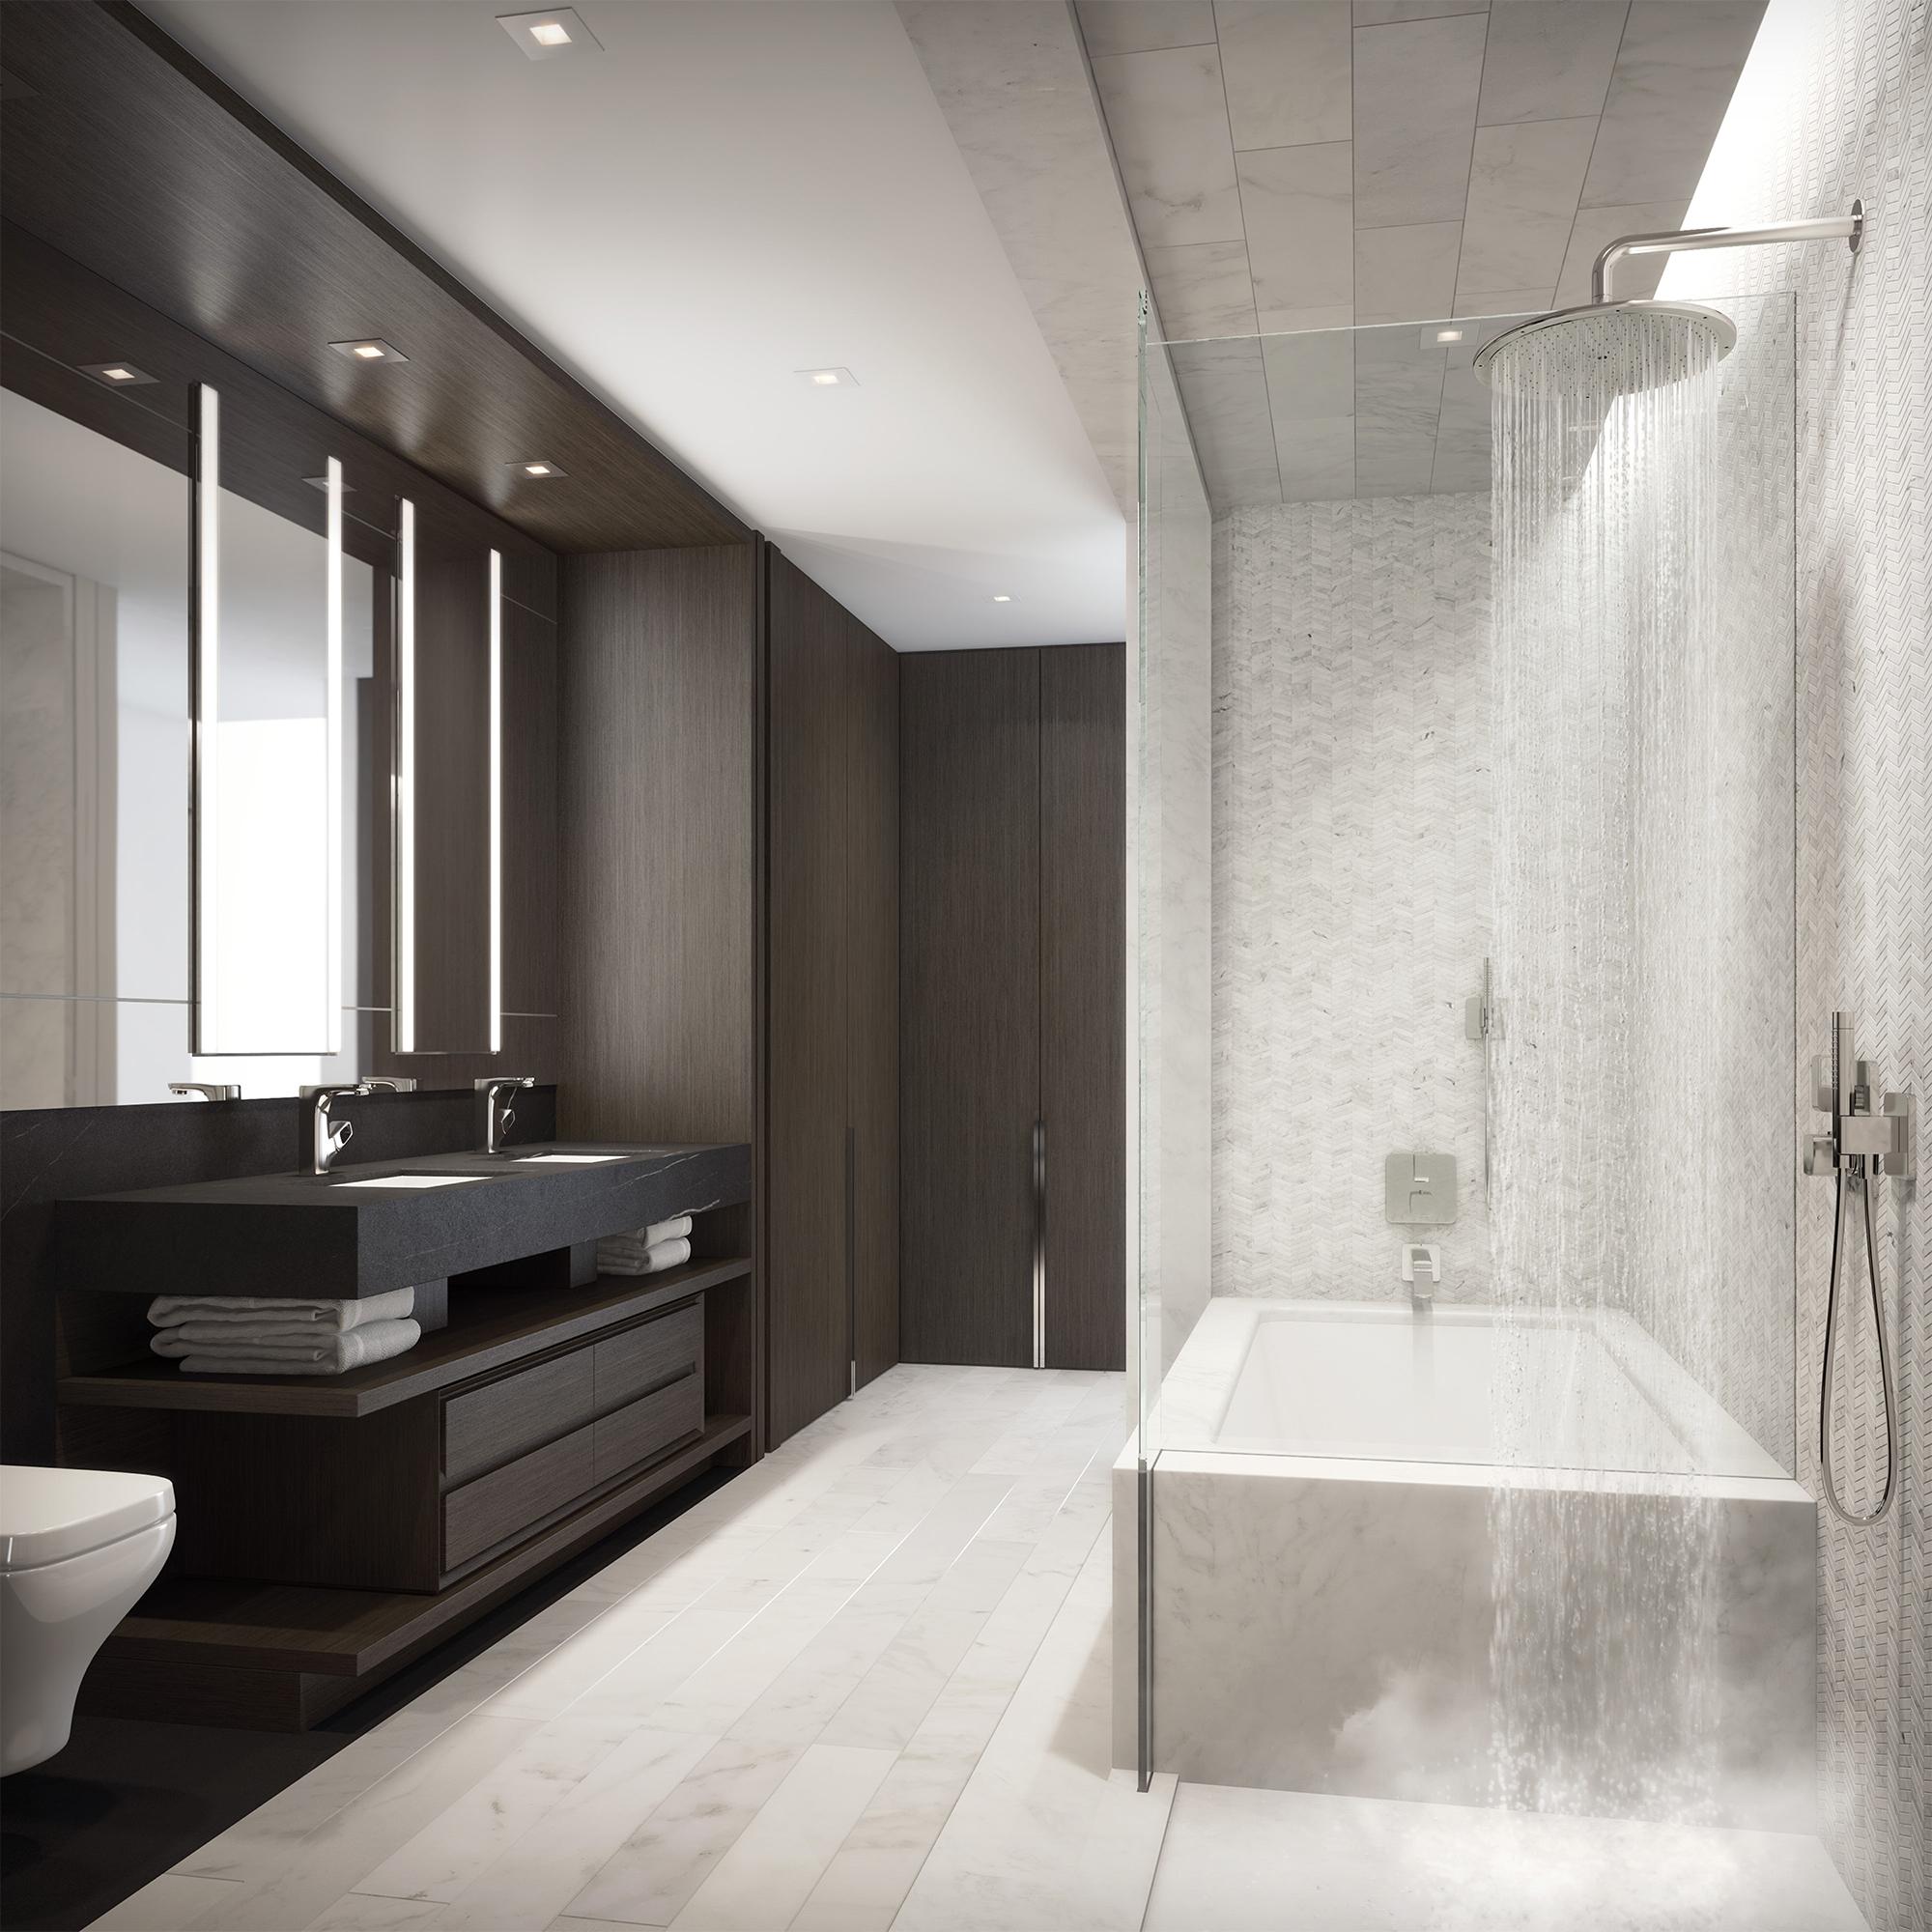 Master Bath and Living Room 15.0402_251W14_P3R2-2-2_2.jpg